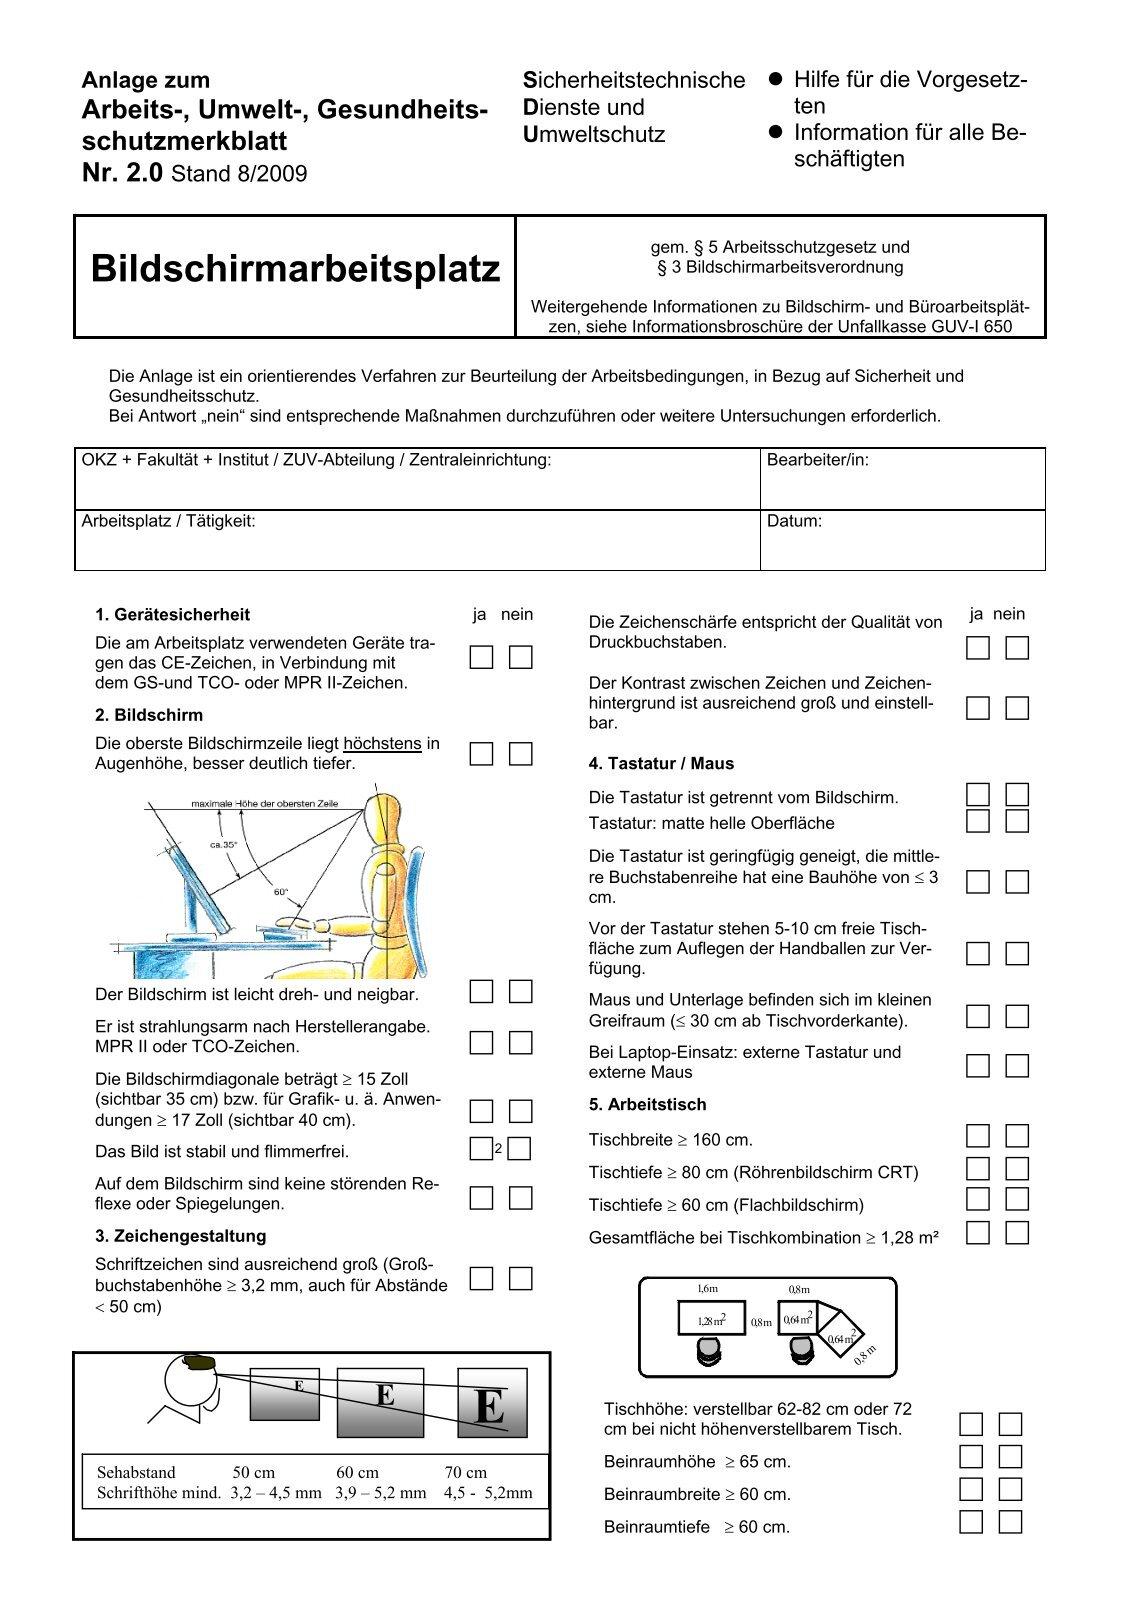 20 free Magazines from ARBEITS.UMWELTSCHUTZ.TU.BERLIN.DE